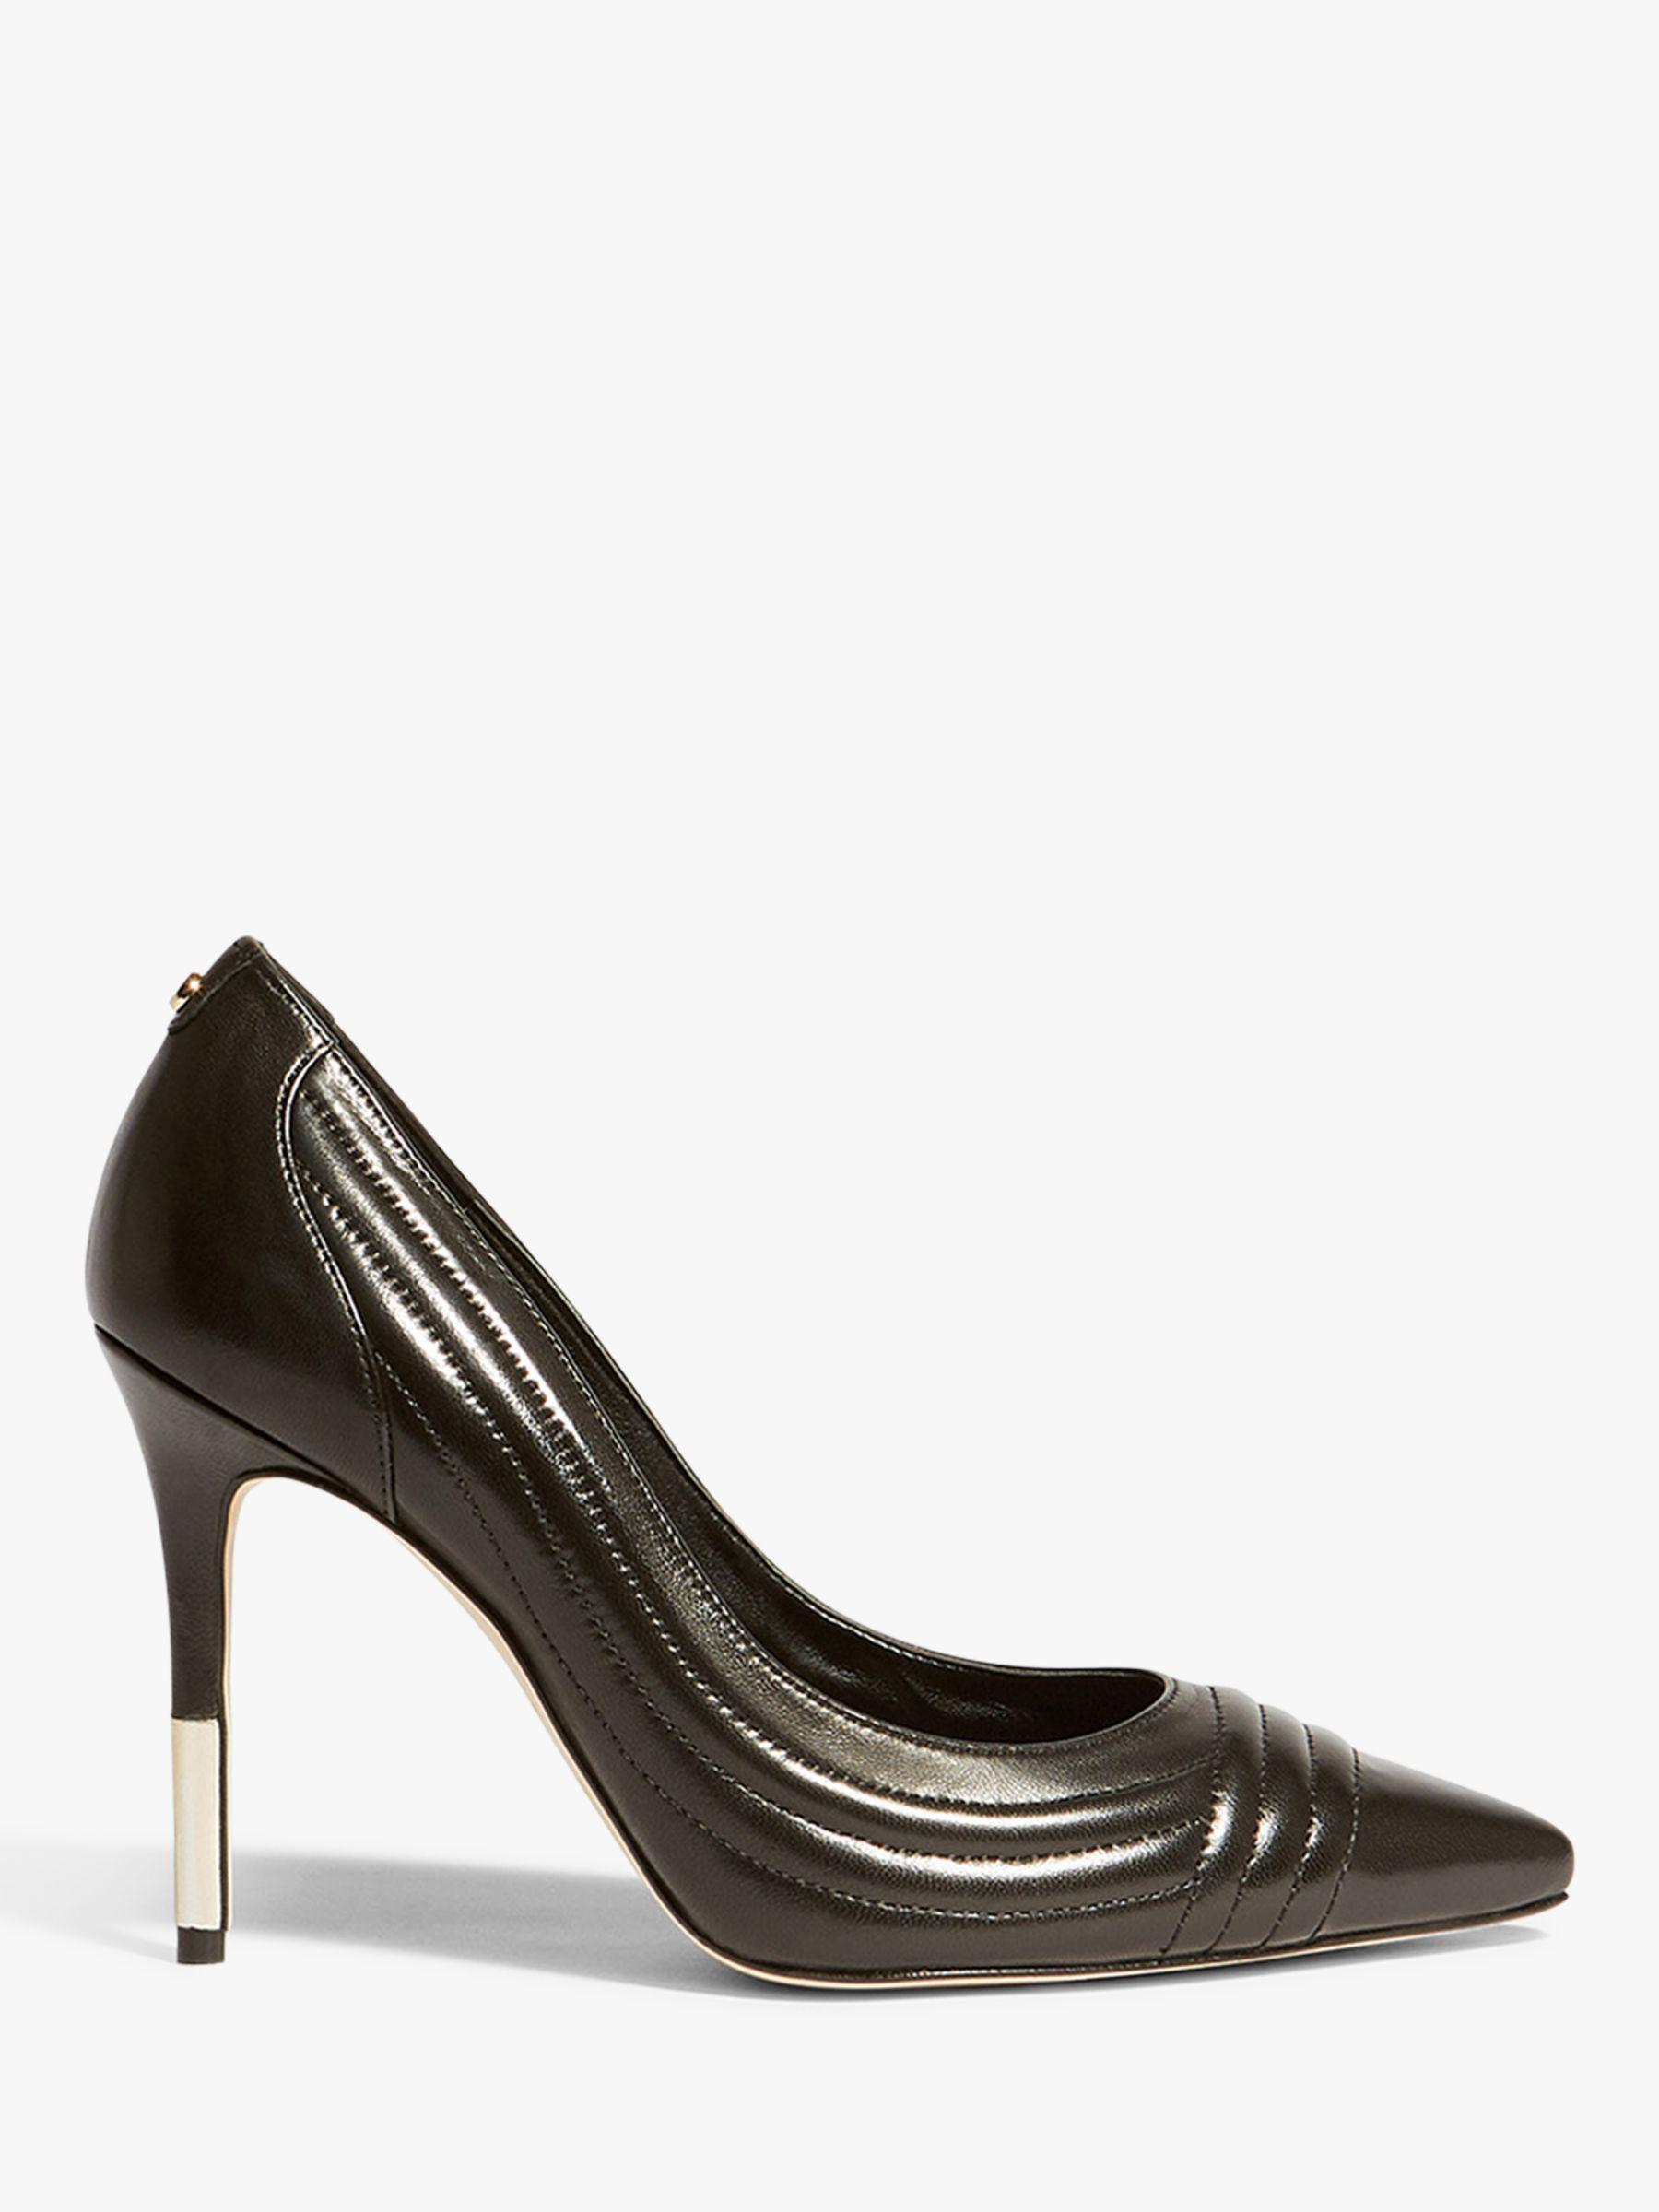 75333f2c24a Karen Millen Tipped High Heel Court Shoes in Black - Save 40% - Lyst